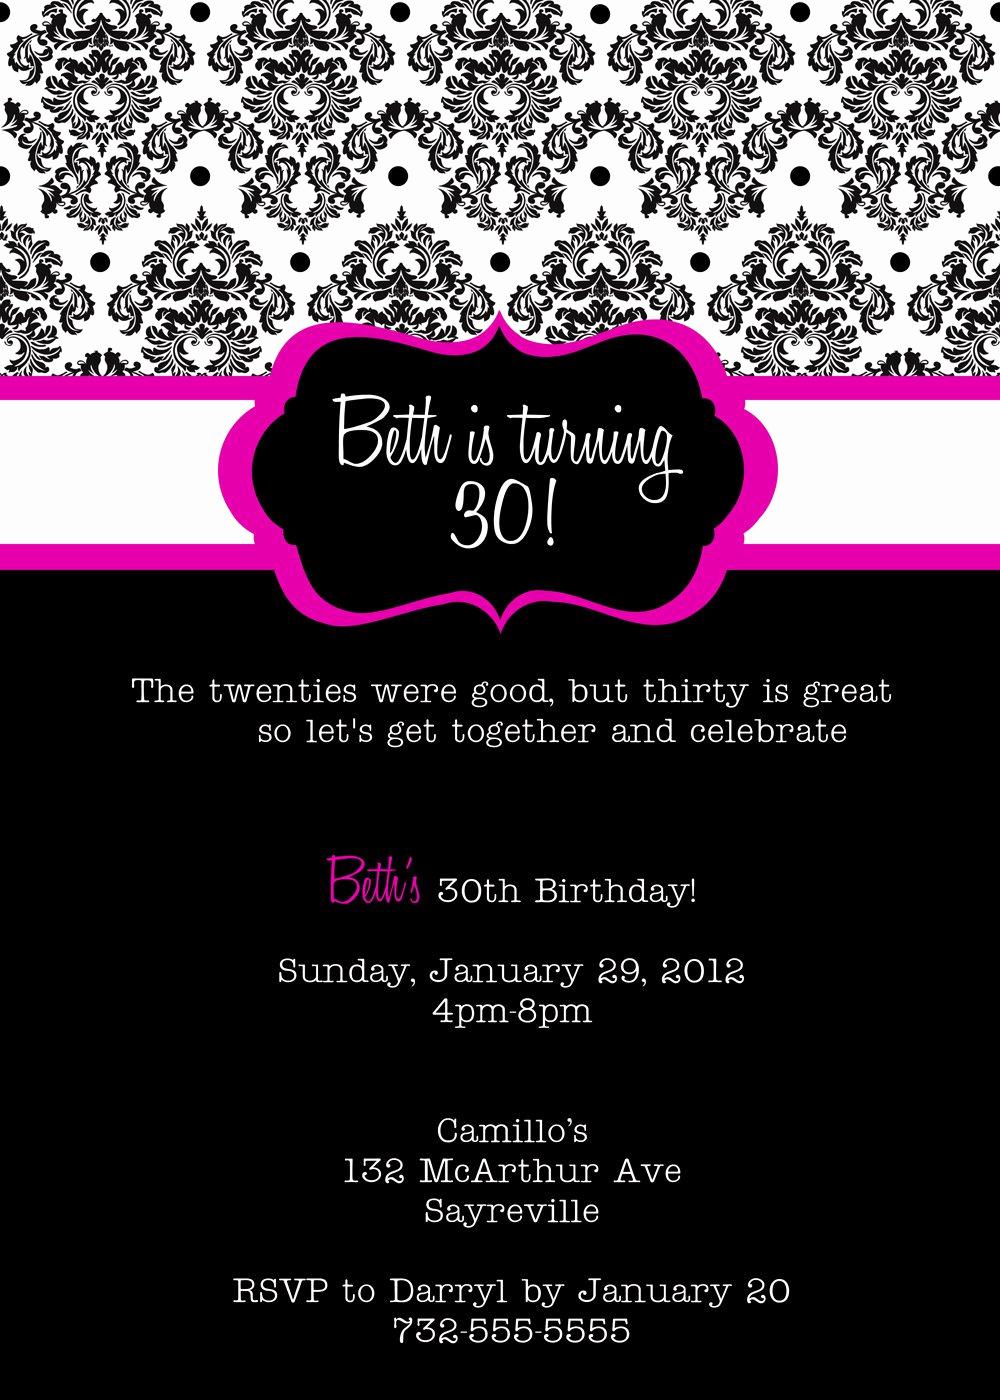 Free Invitation Templates Printable Beautiful Free Printable Birthday Invitation Templates for Adults